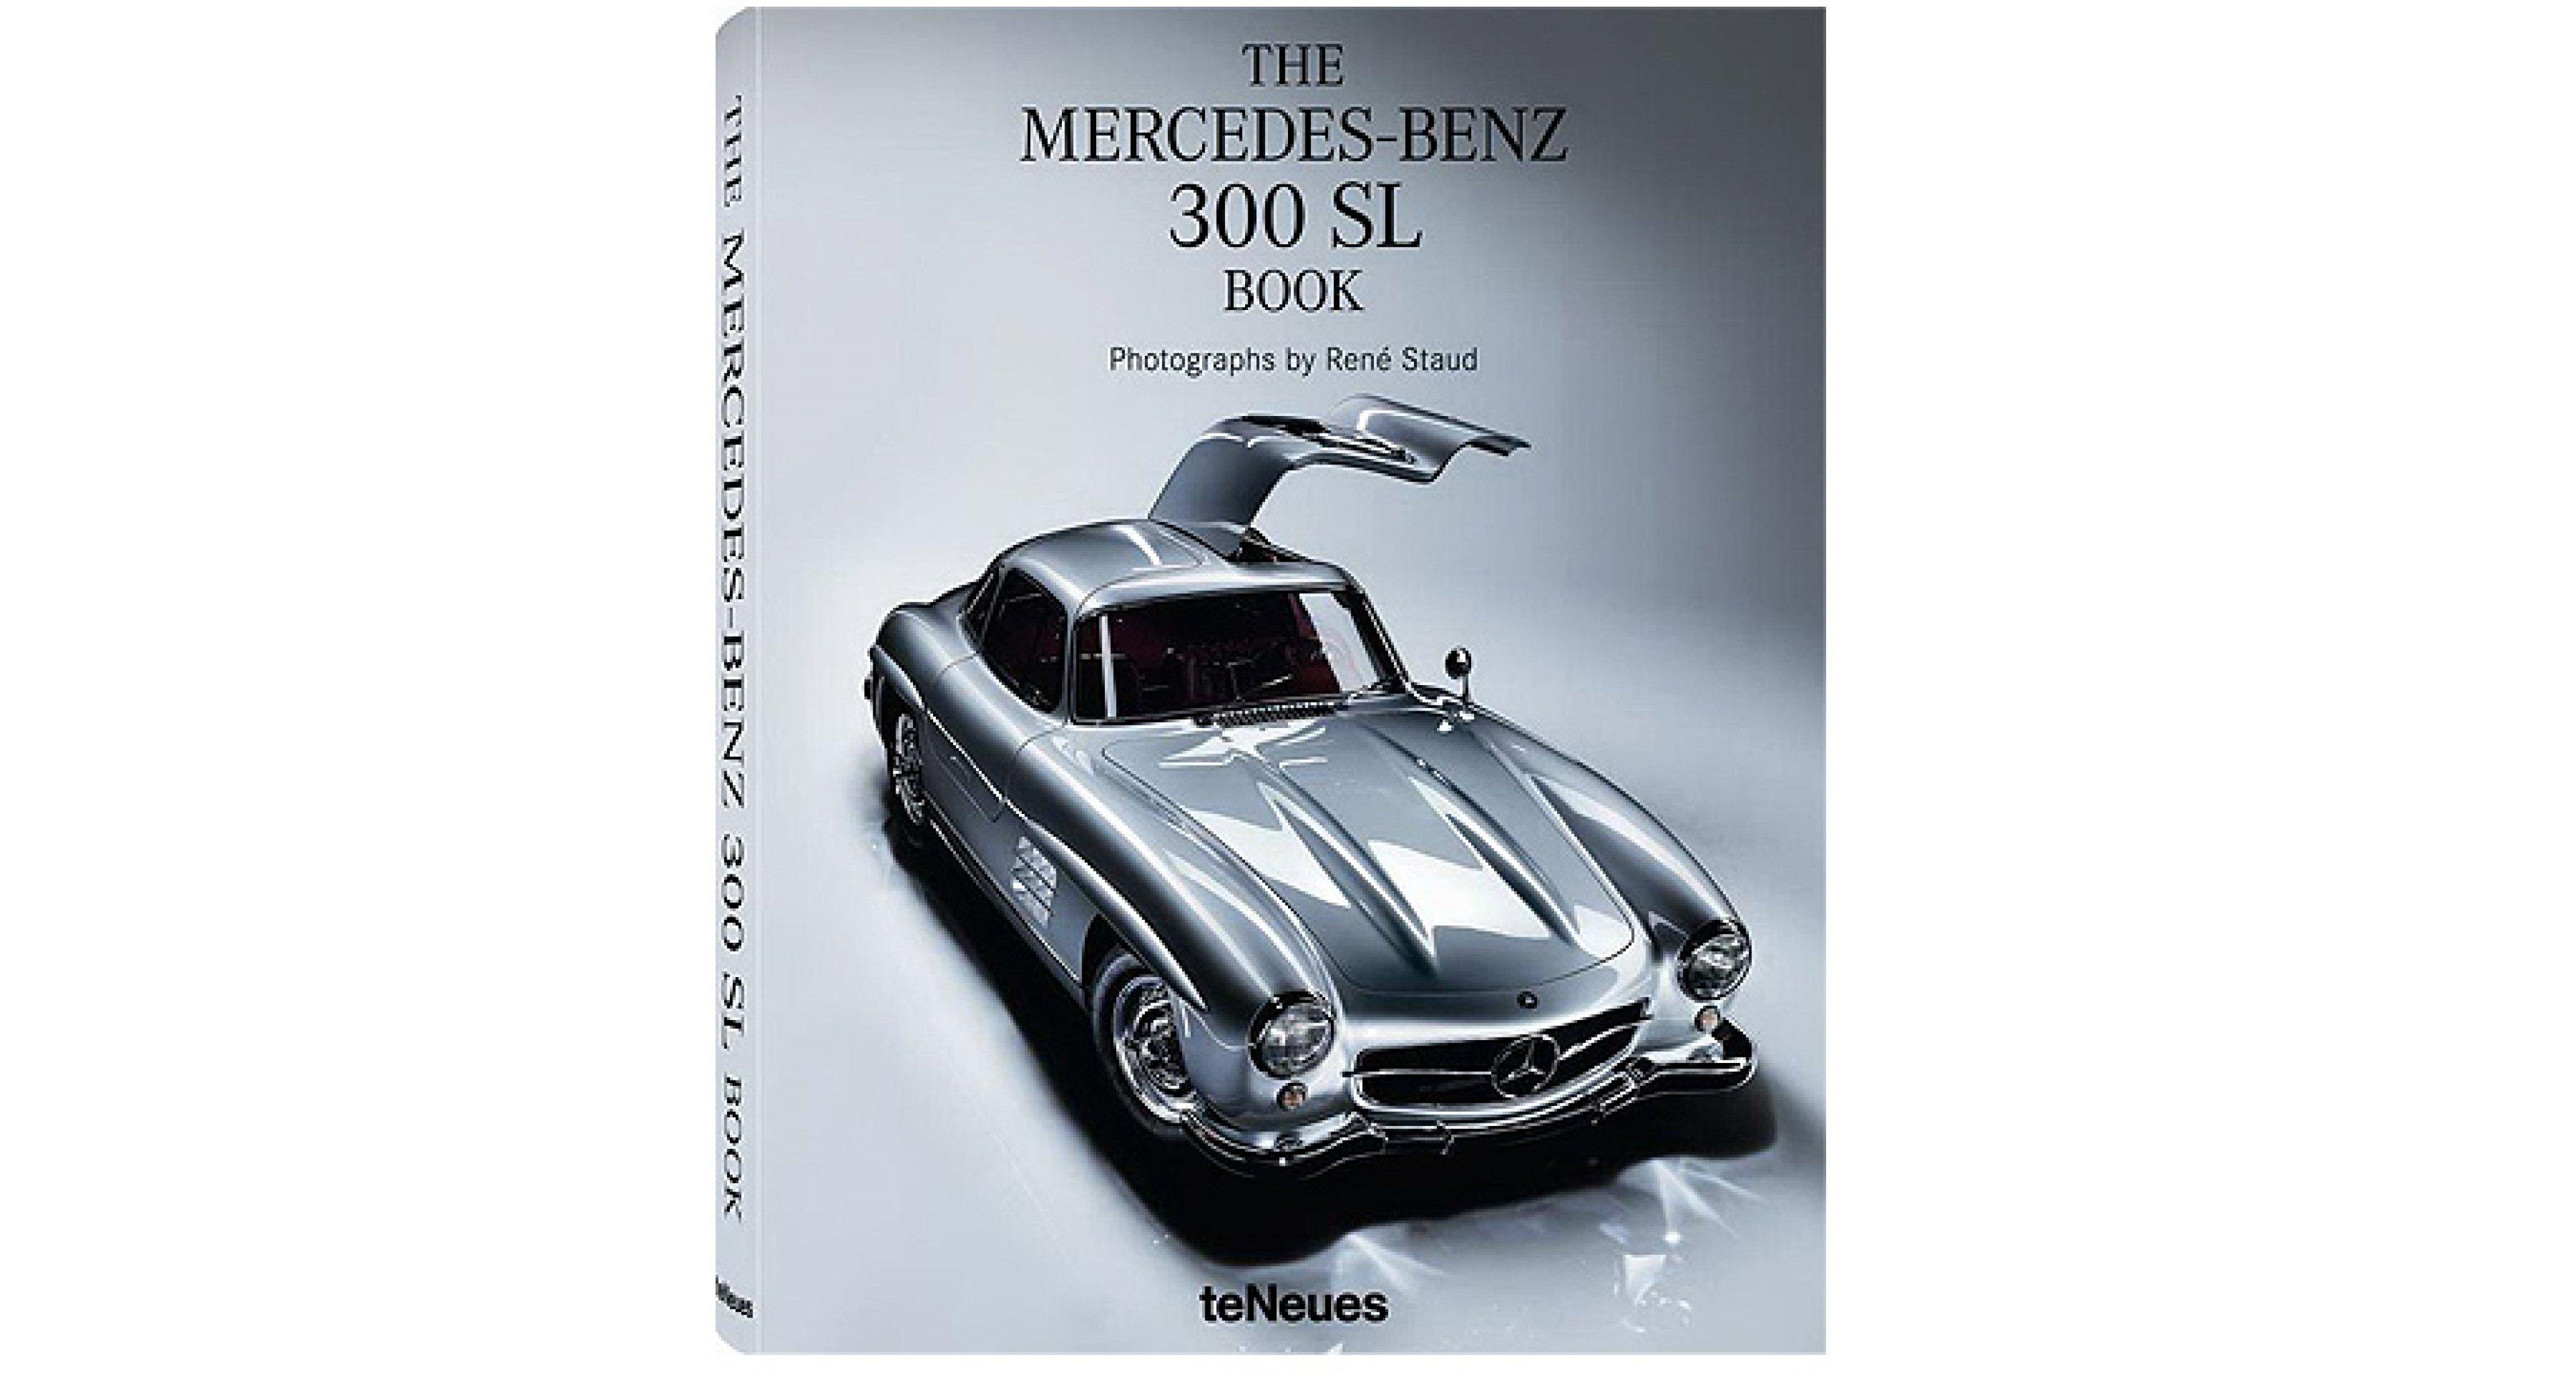 The mercedes benz 300sl book classic driver magazine for Mercedes benz classic magazine